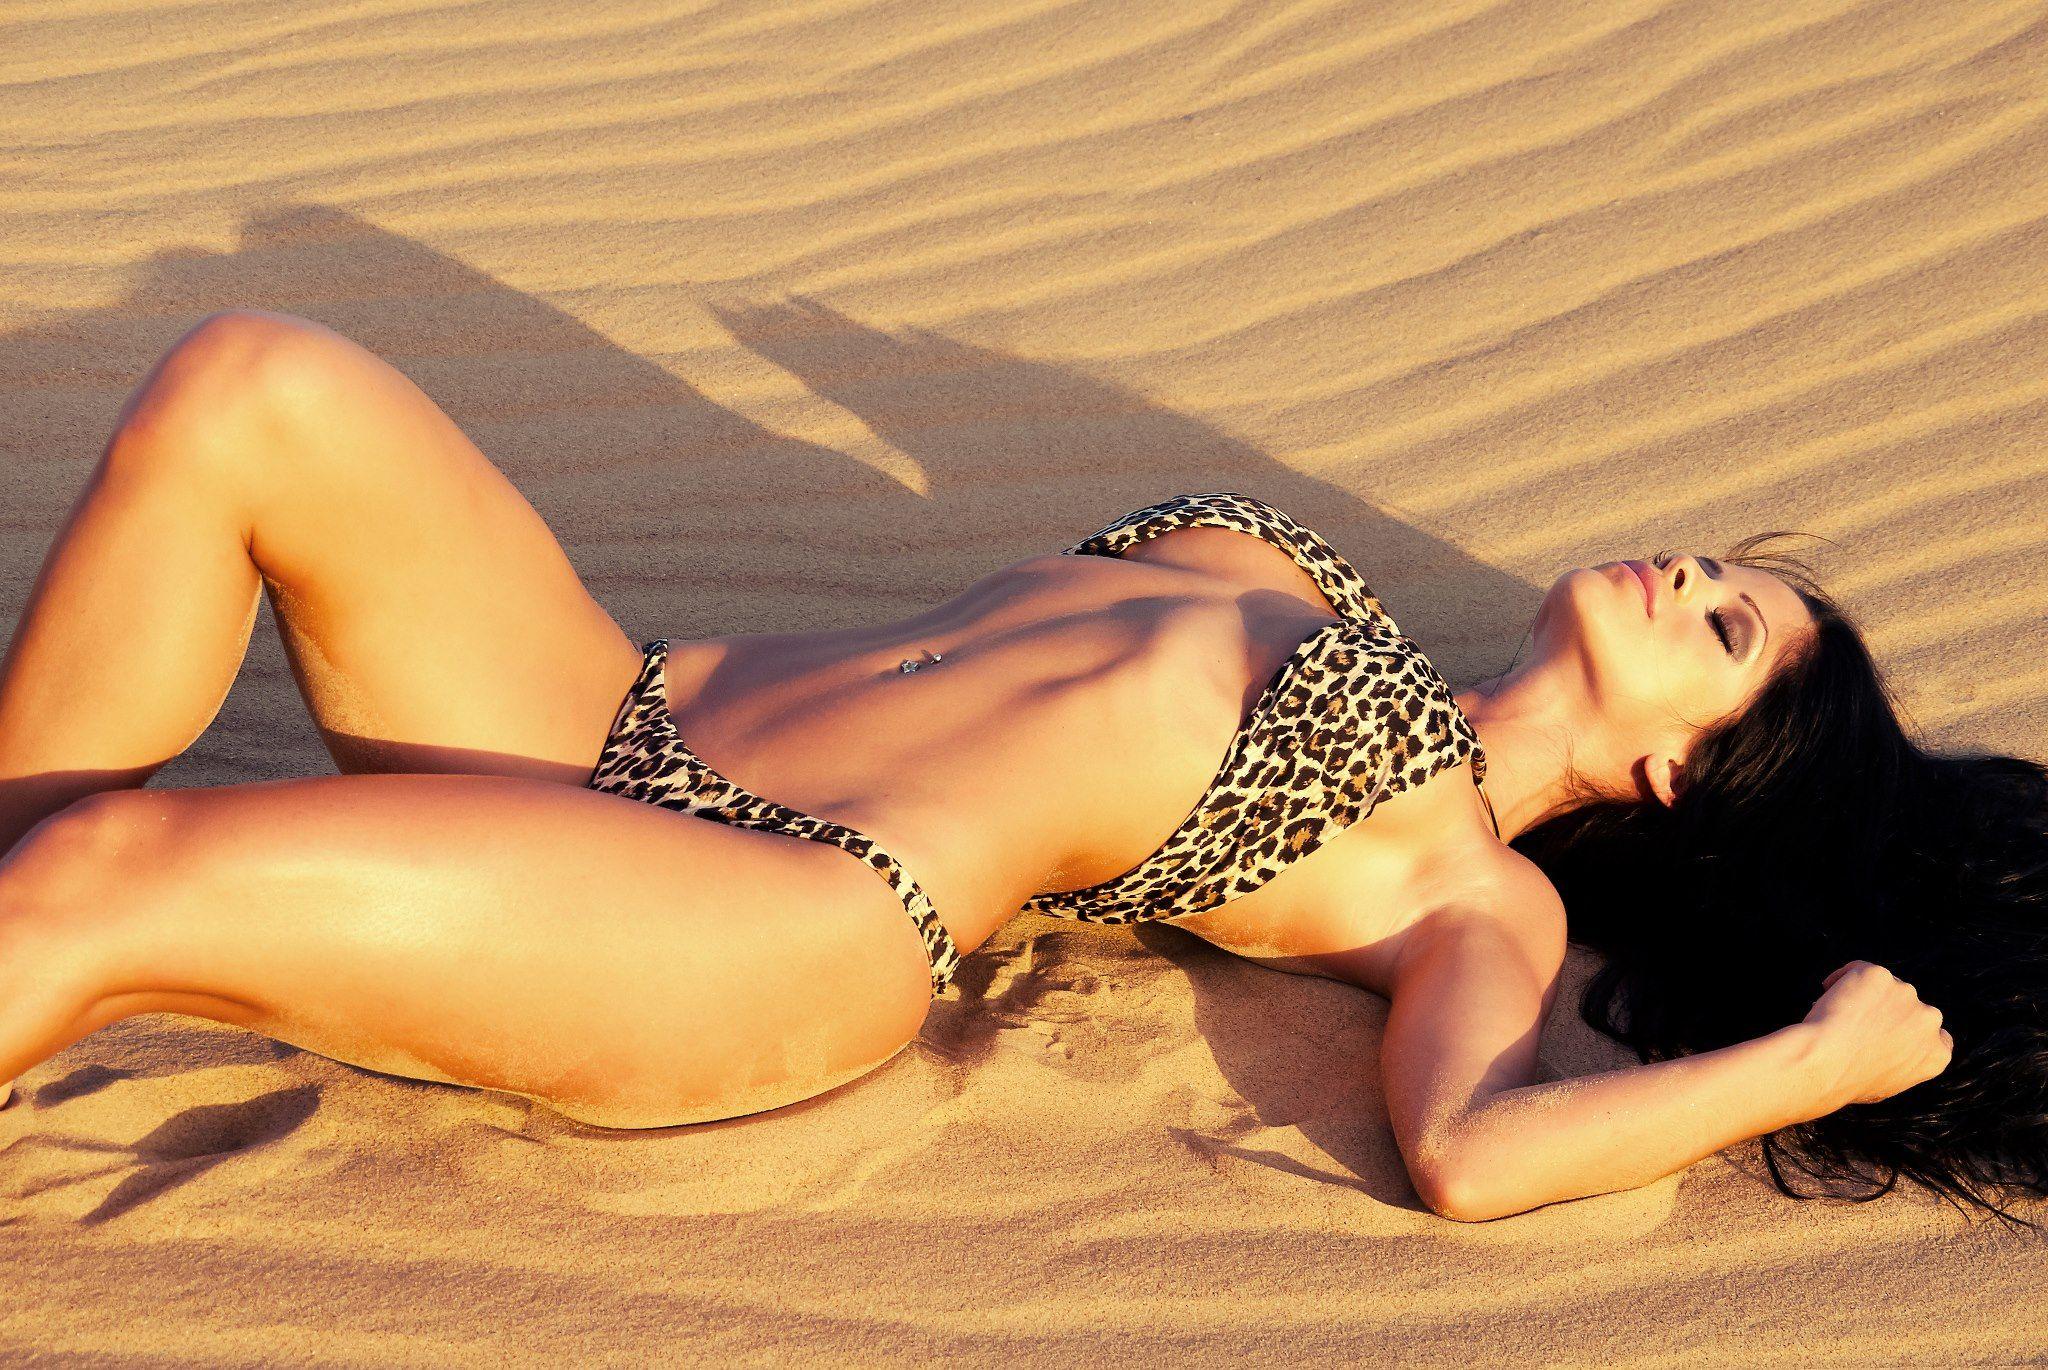 Brazilian Playmates Pretty hot brazilian fitness bodies - google search   fitness & health